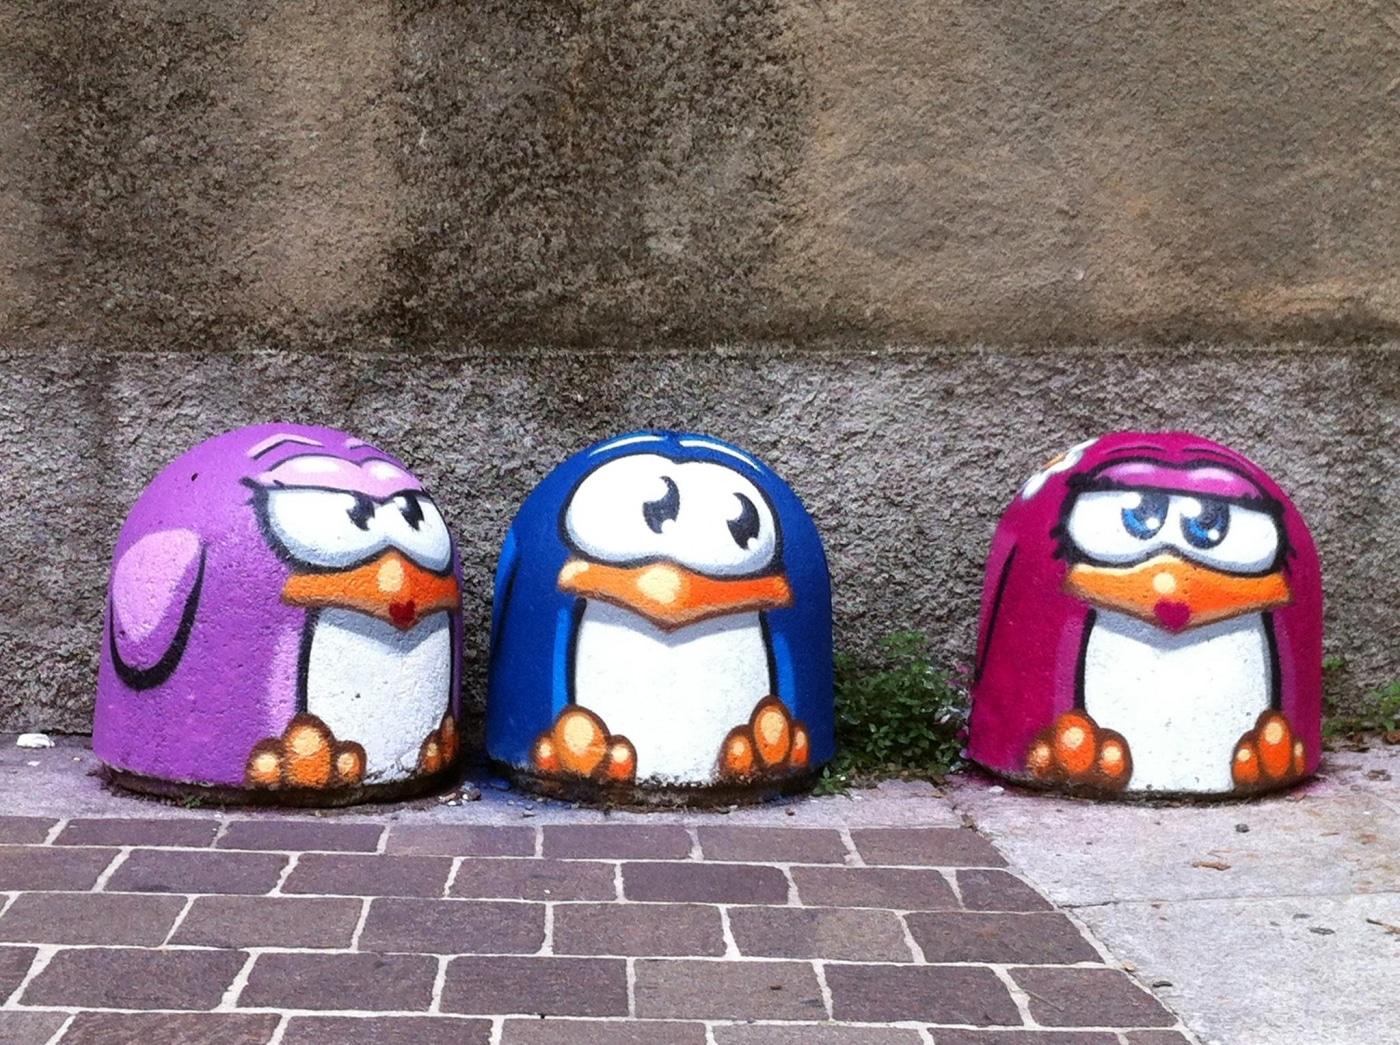 Pao Pao street art - 15 Playful Street Artists